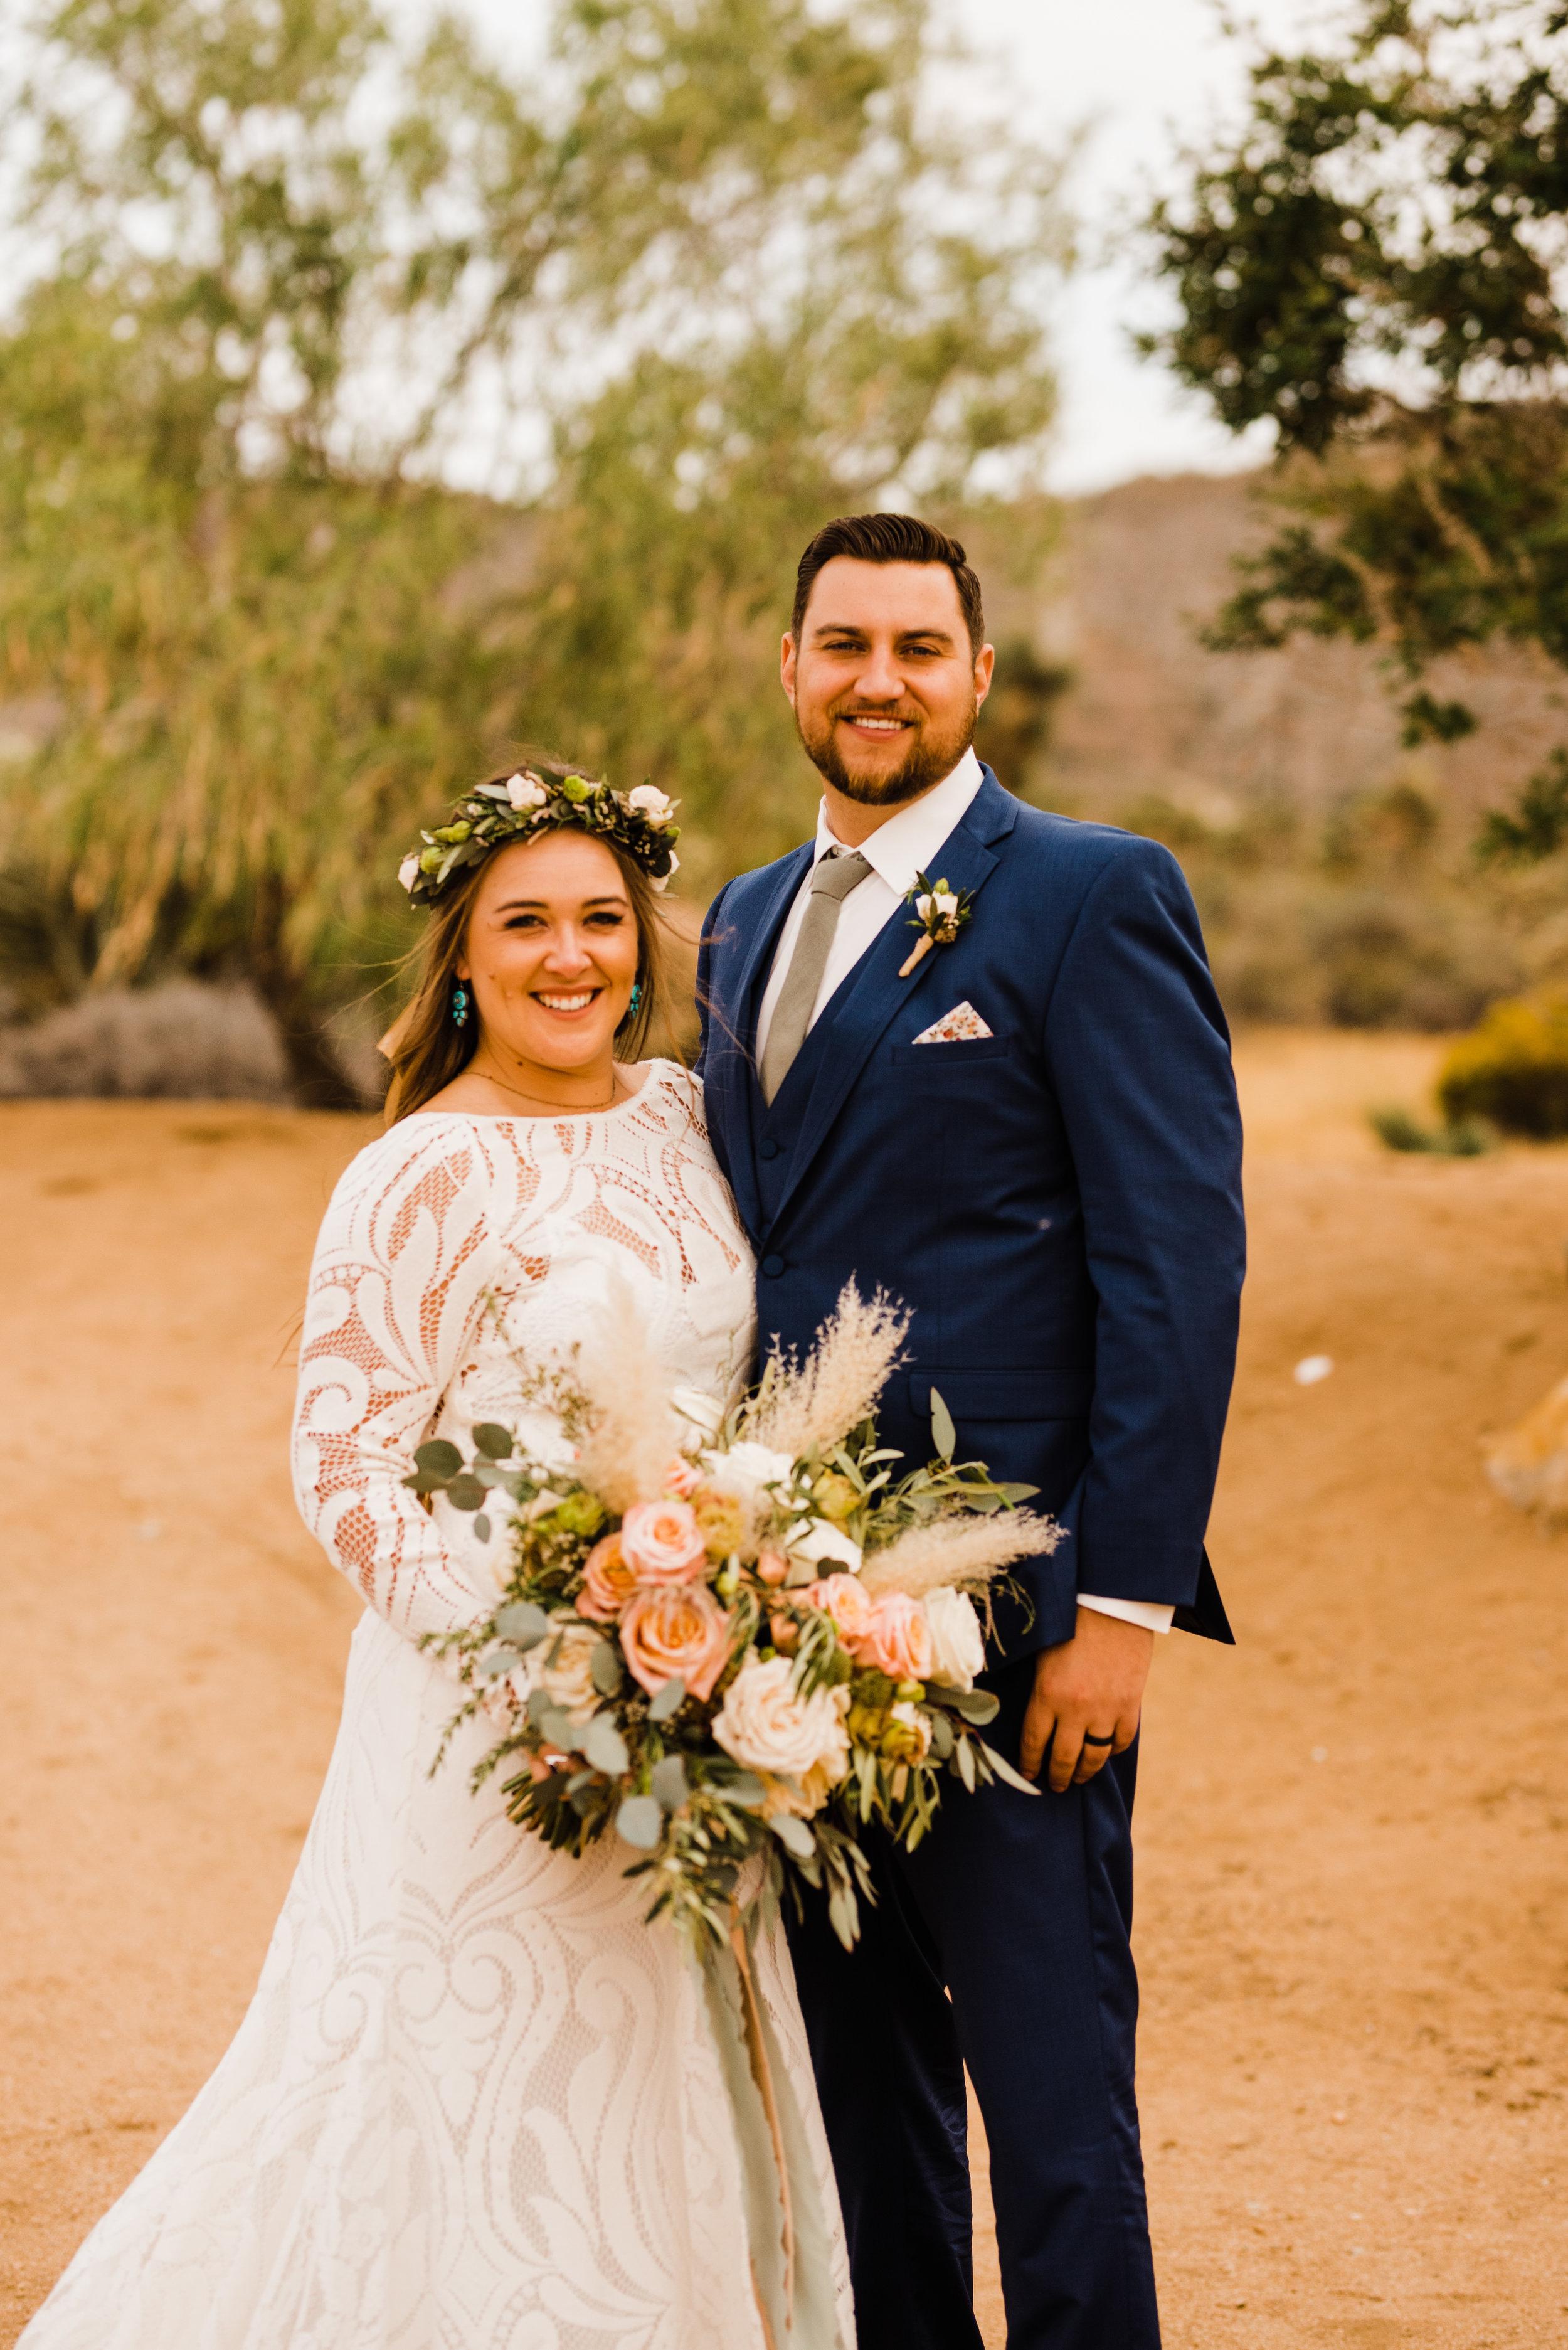 Tumbleweed-Sanctuary-Wedding-Portraits (17).jpg